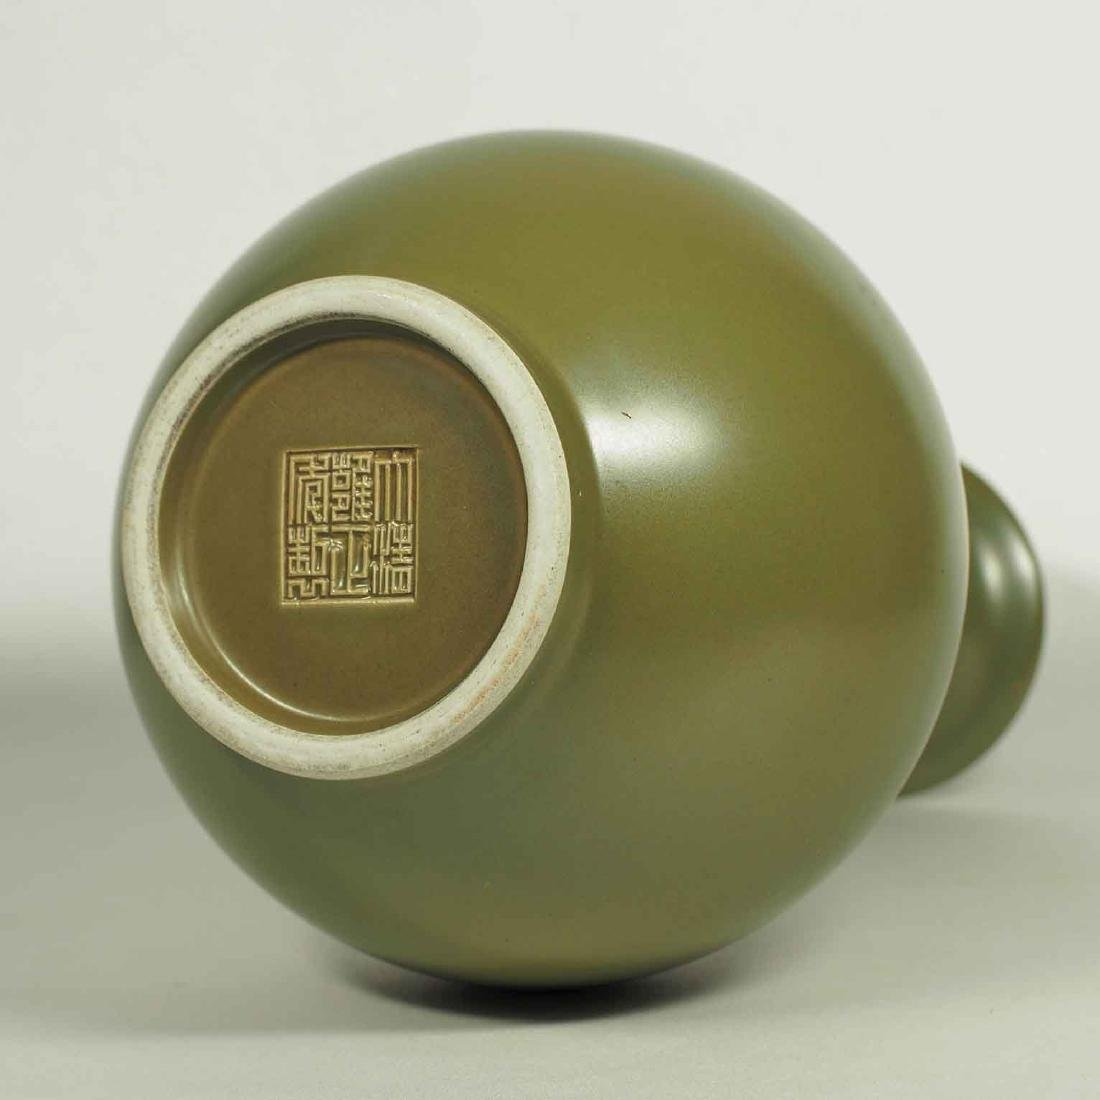 Teadust Monochrome Vase, Qianlong Mark, late Qing - 4